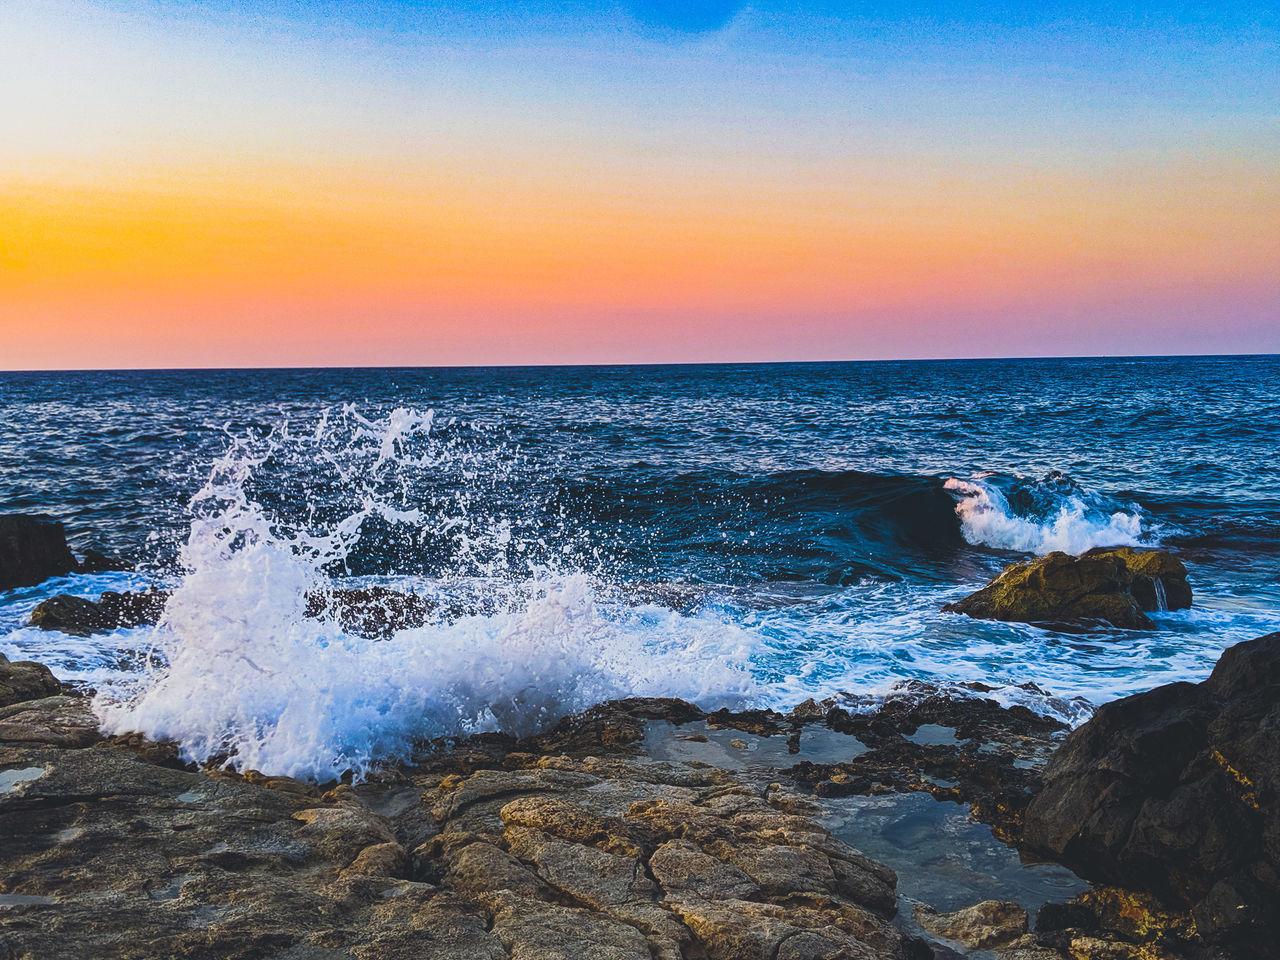 SCENIC VIEW OF SEA WAVES SPLASHING ON ROCKS AT SUNSET